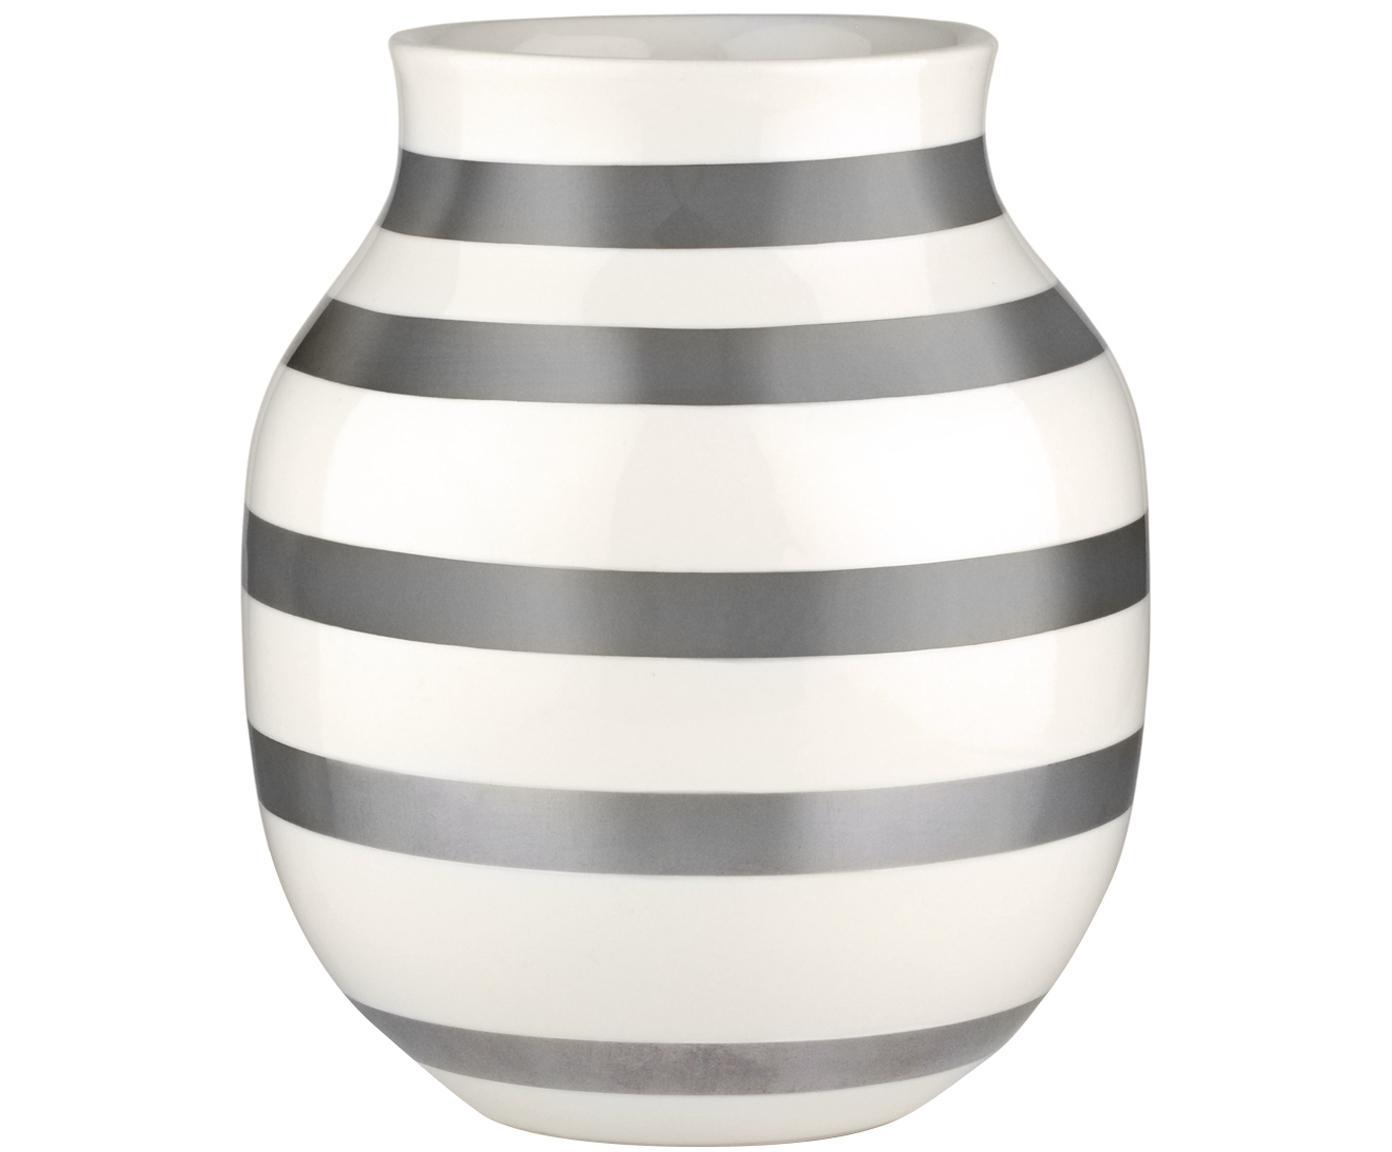 Handgemaakte design vaas Omaggio, medium, Keramiek, Zilverkleurig, wit, Ø 17 x H 20 cm